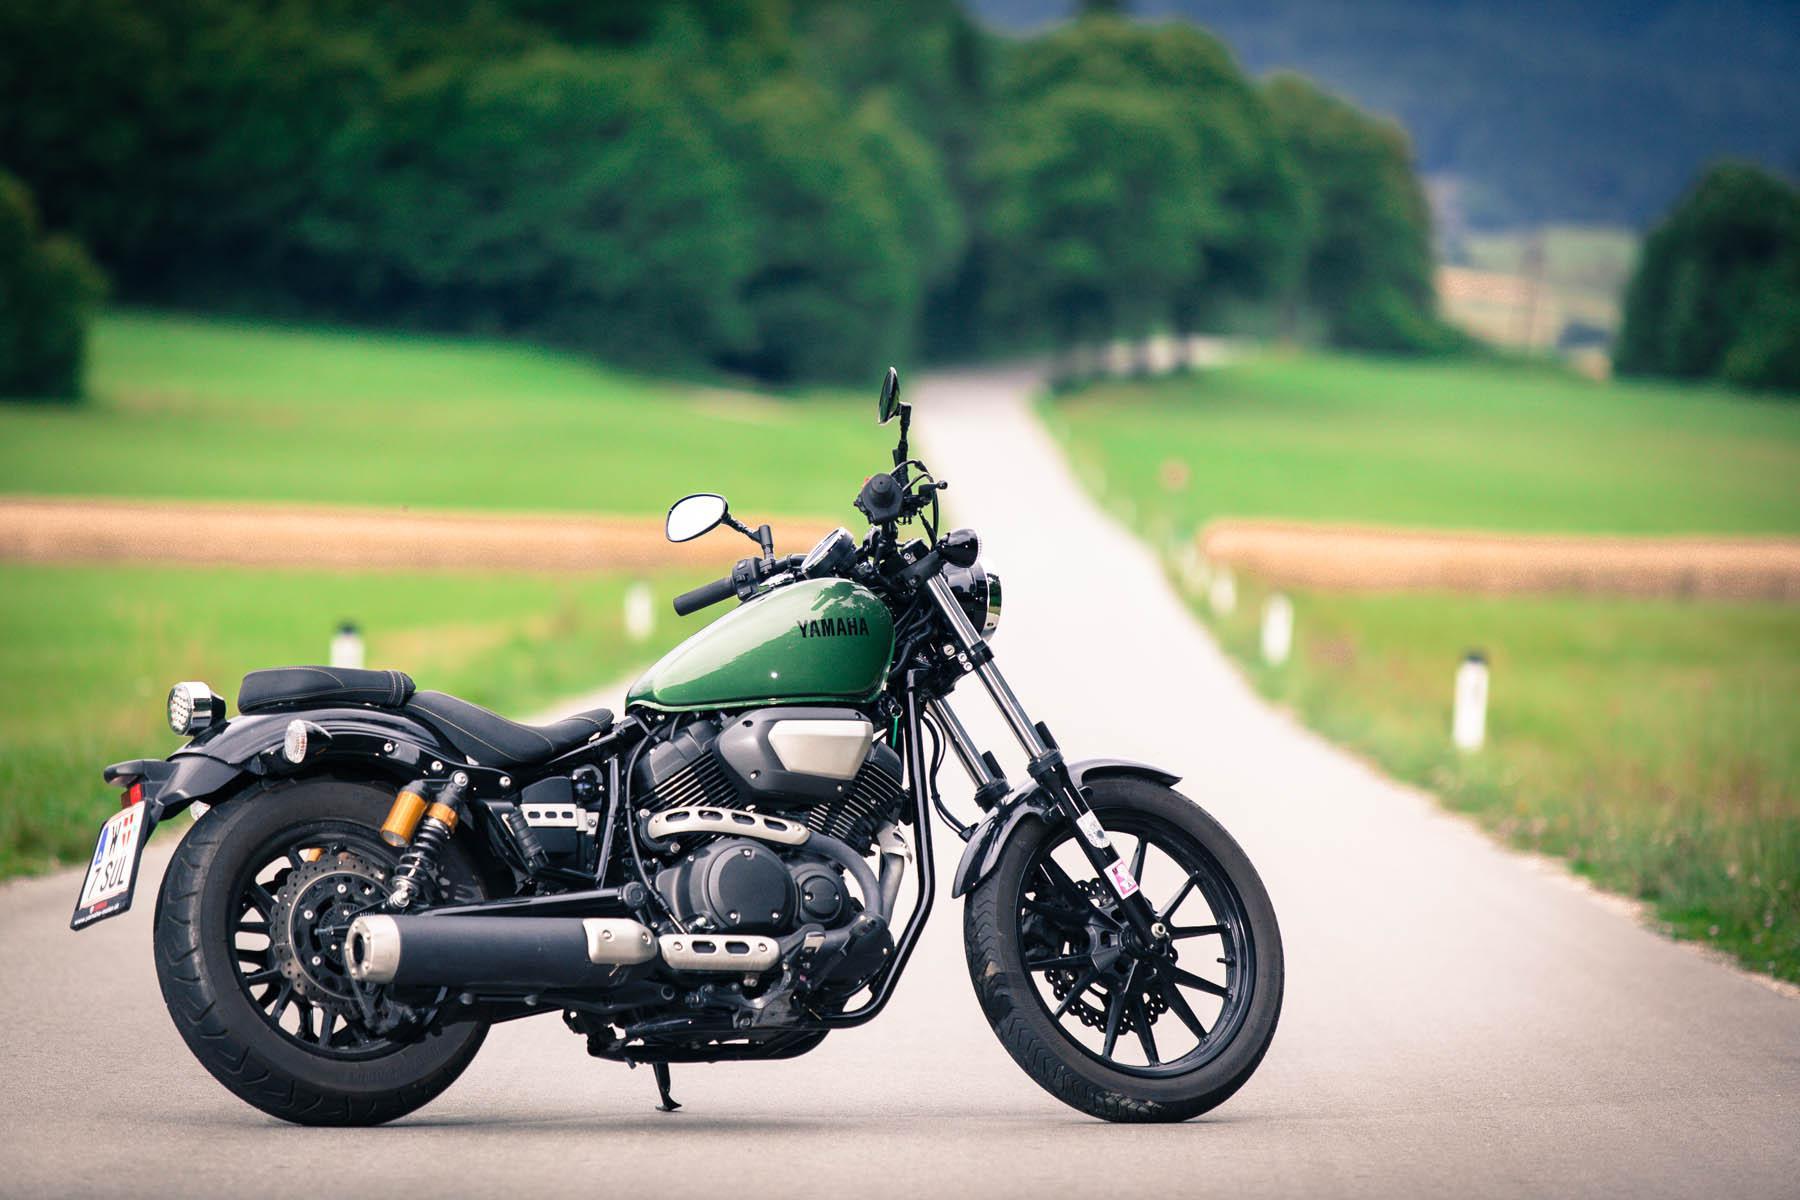 http://www.motorrad-bilder.at/slideshows/291/011252/yamaha_xv950-47.jpg